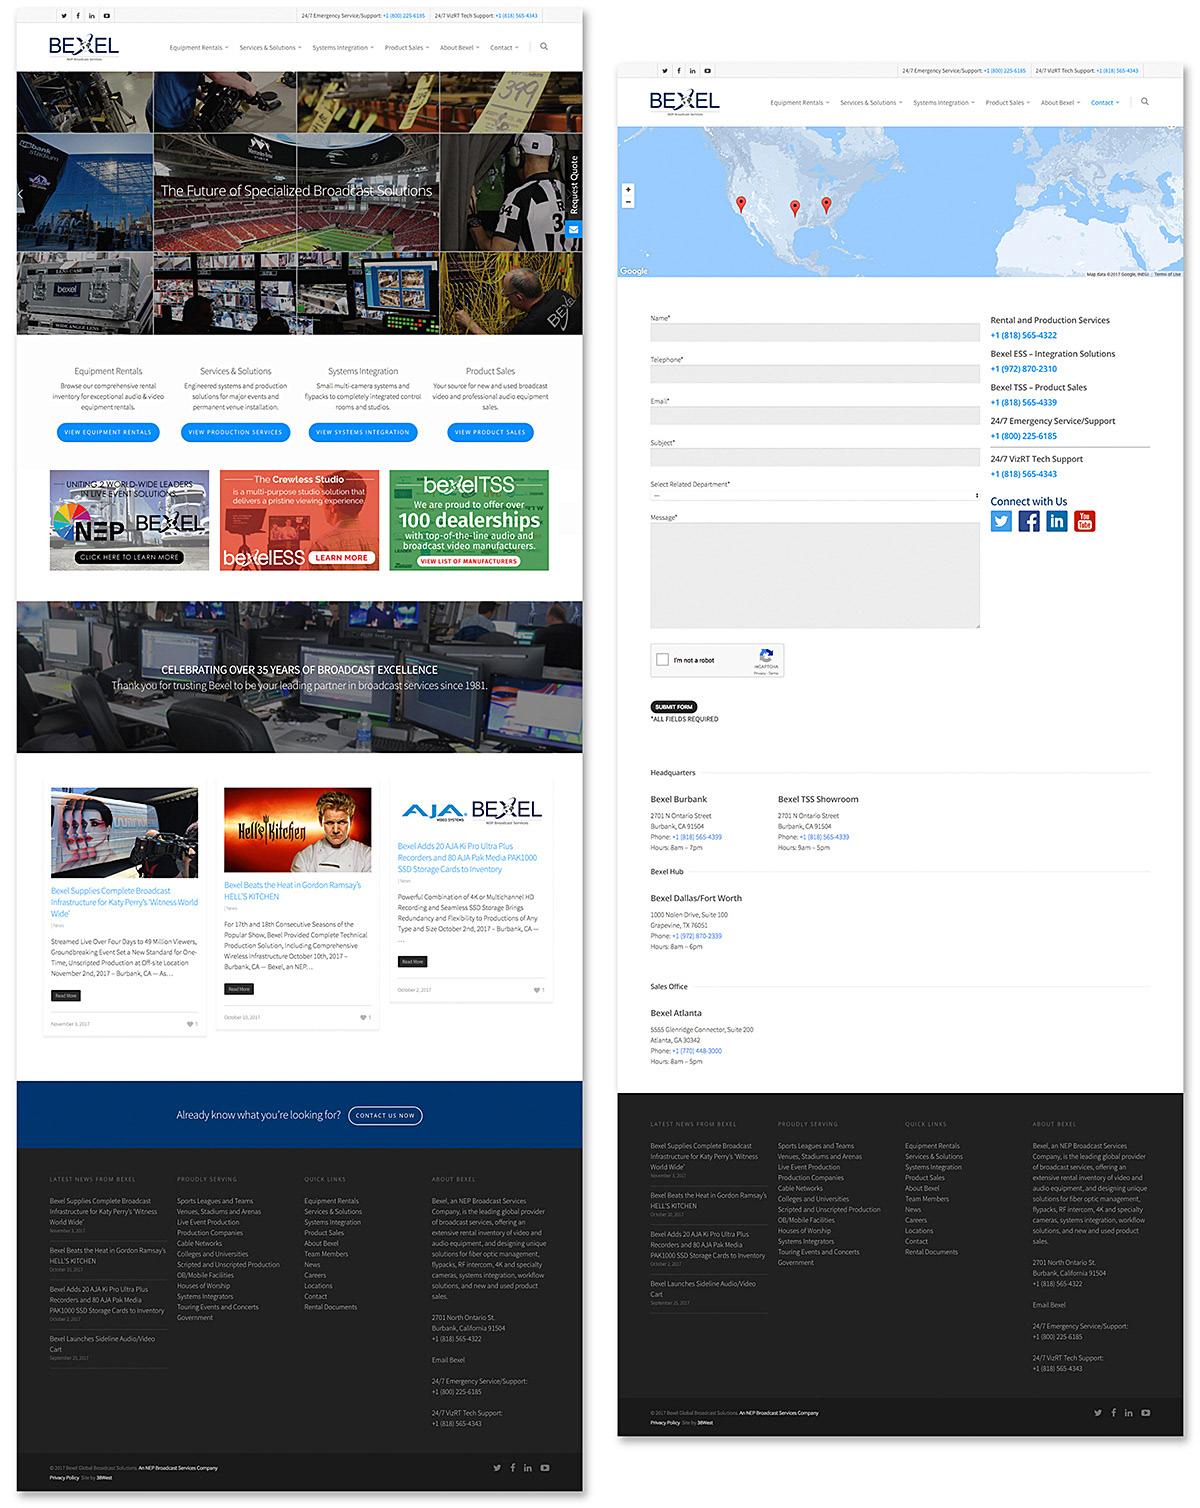 Brian Weiske - Bexel Global Broadcast Solutions | Website Design